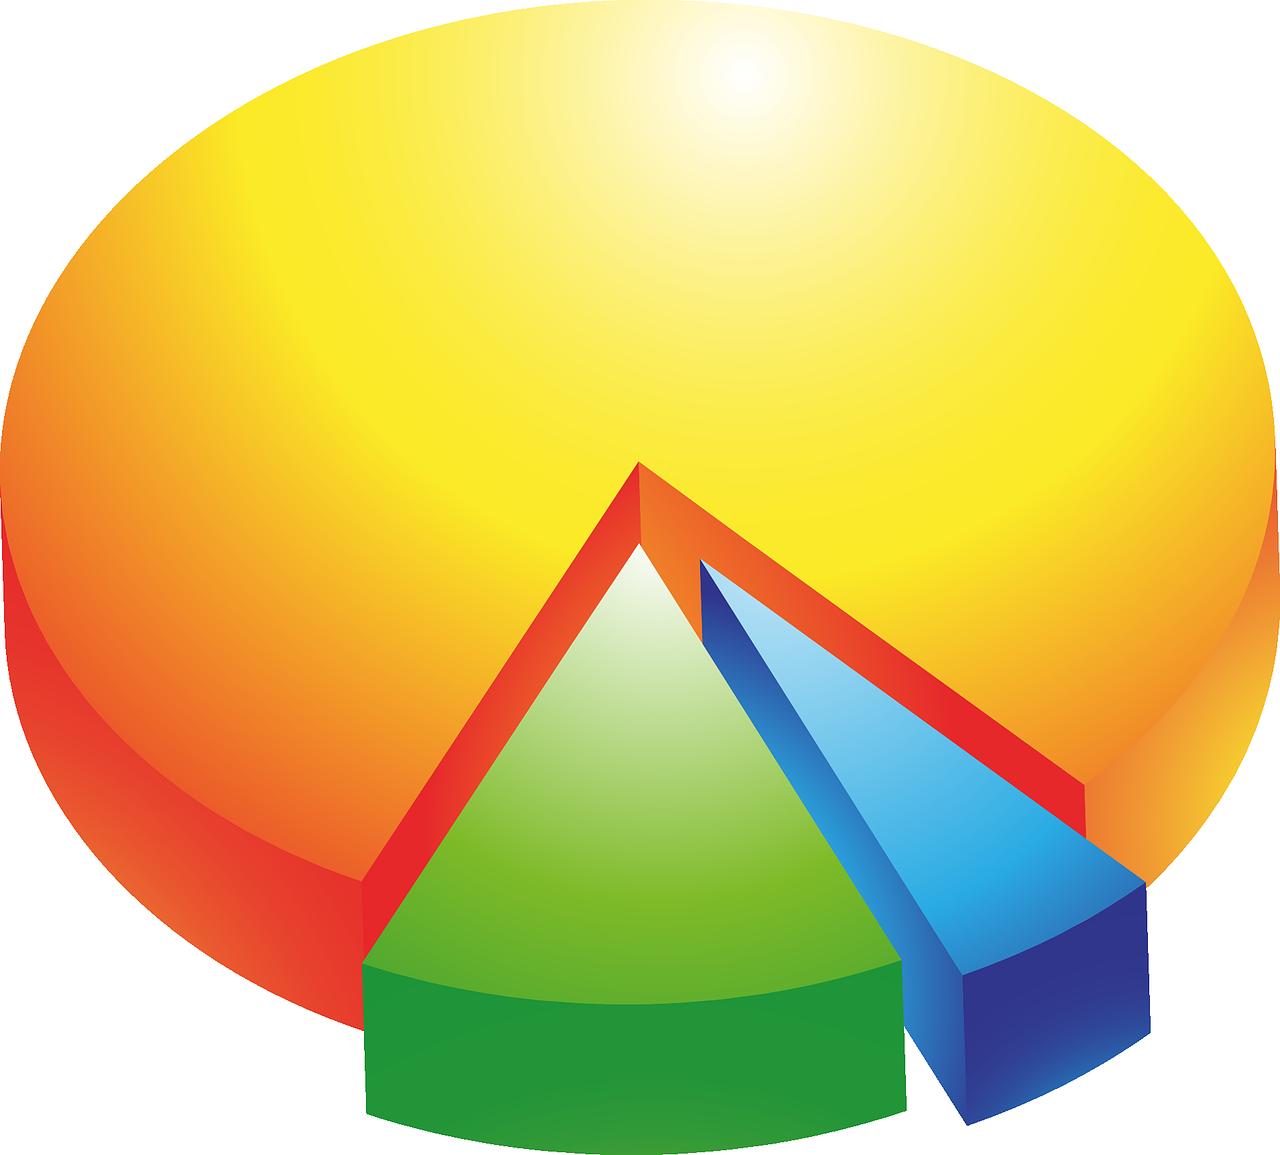 pie-chart-149726_1280